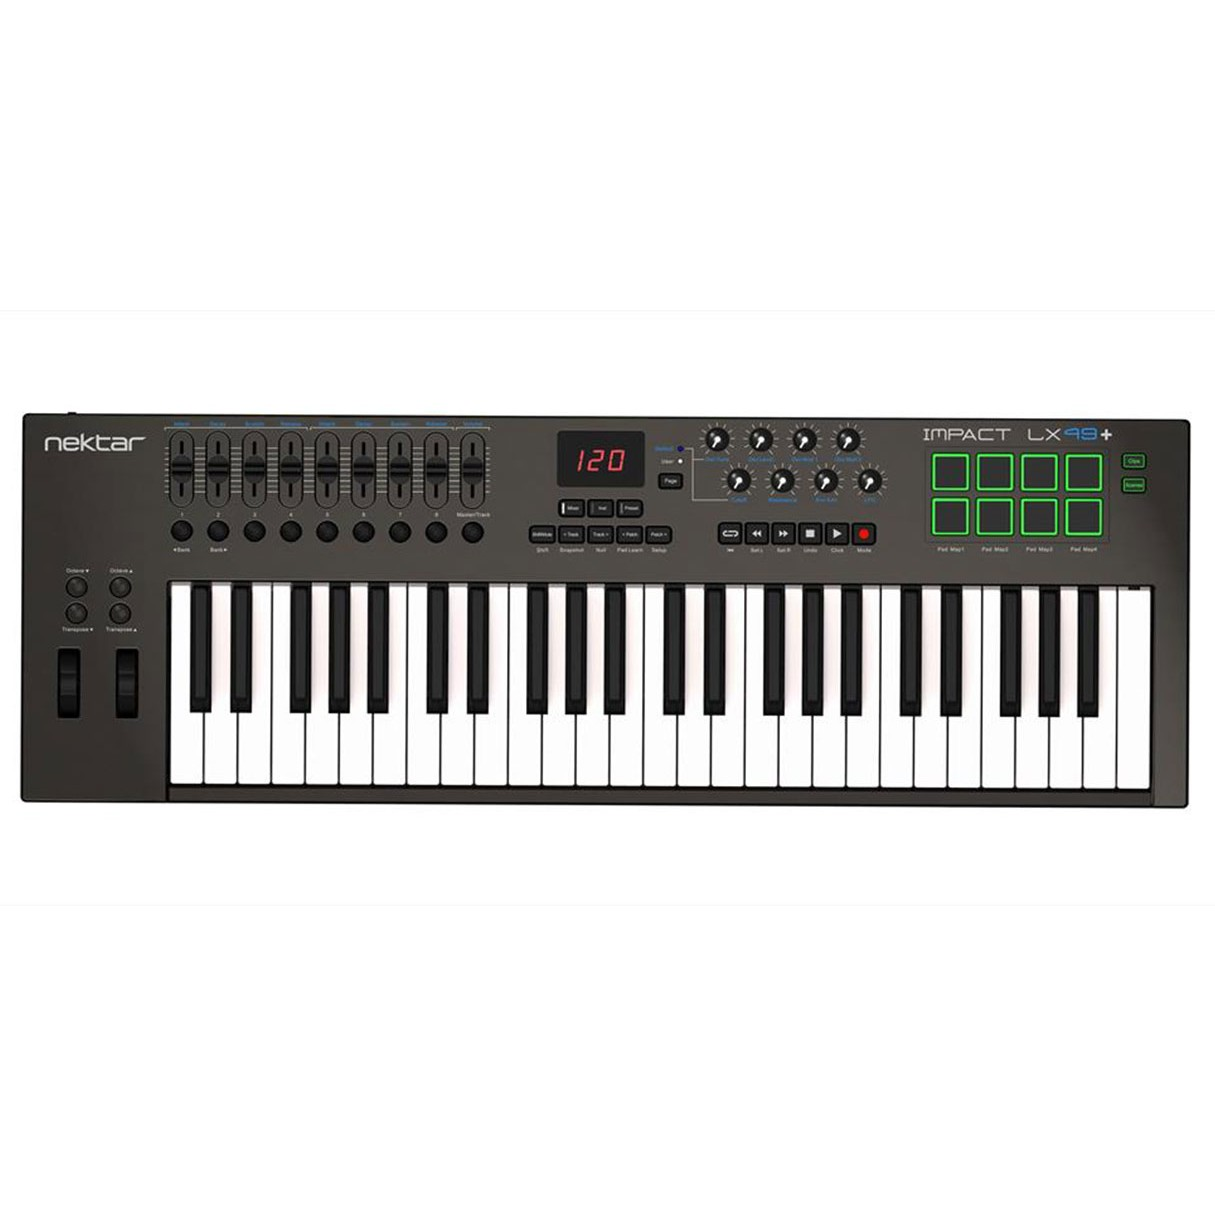 nektar impact lx49 49 key keyboard midi controller with built in daw integration open box. Black Bedroom Furniture Sets. Home Design Ideas